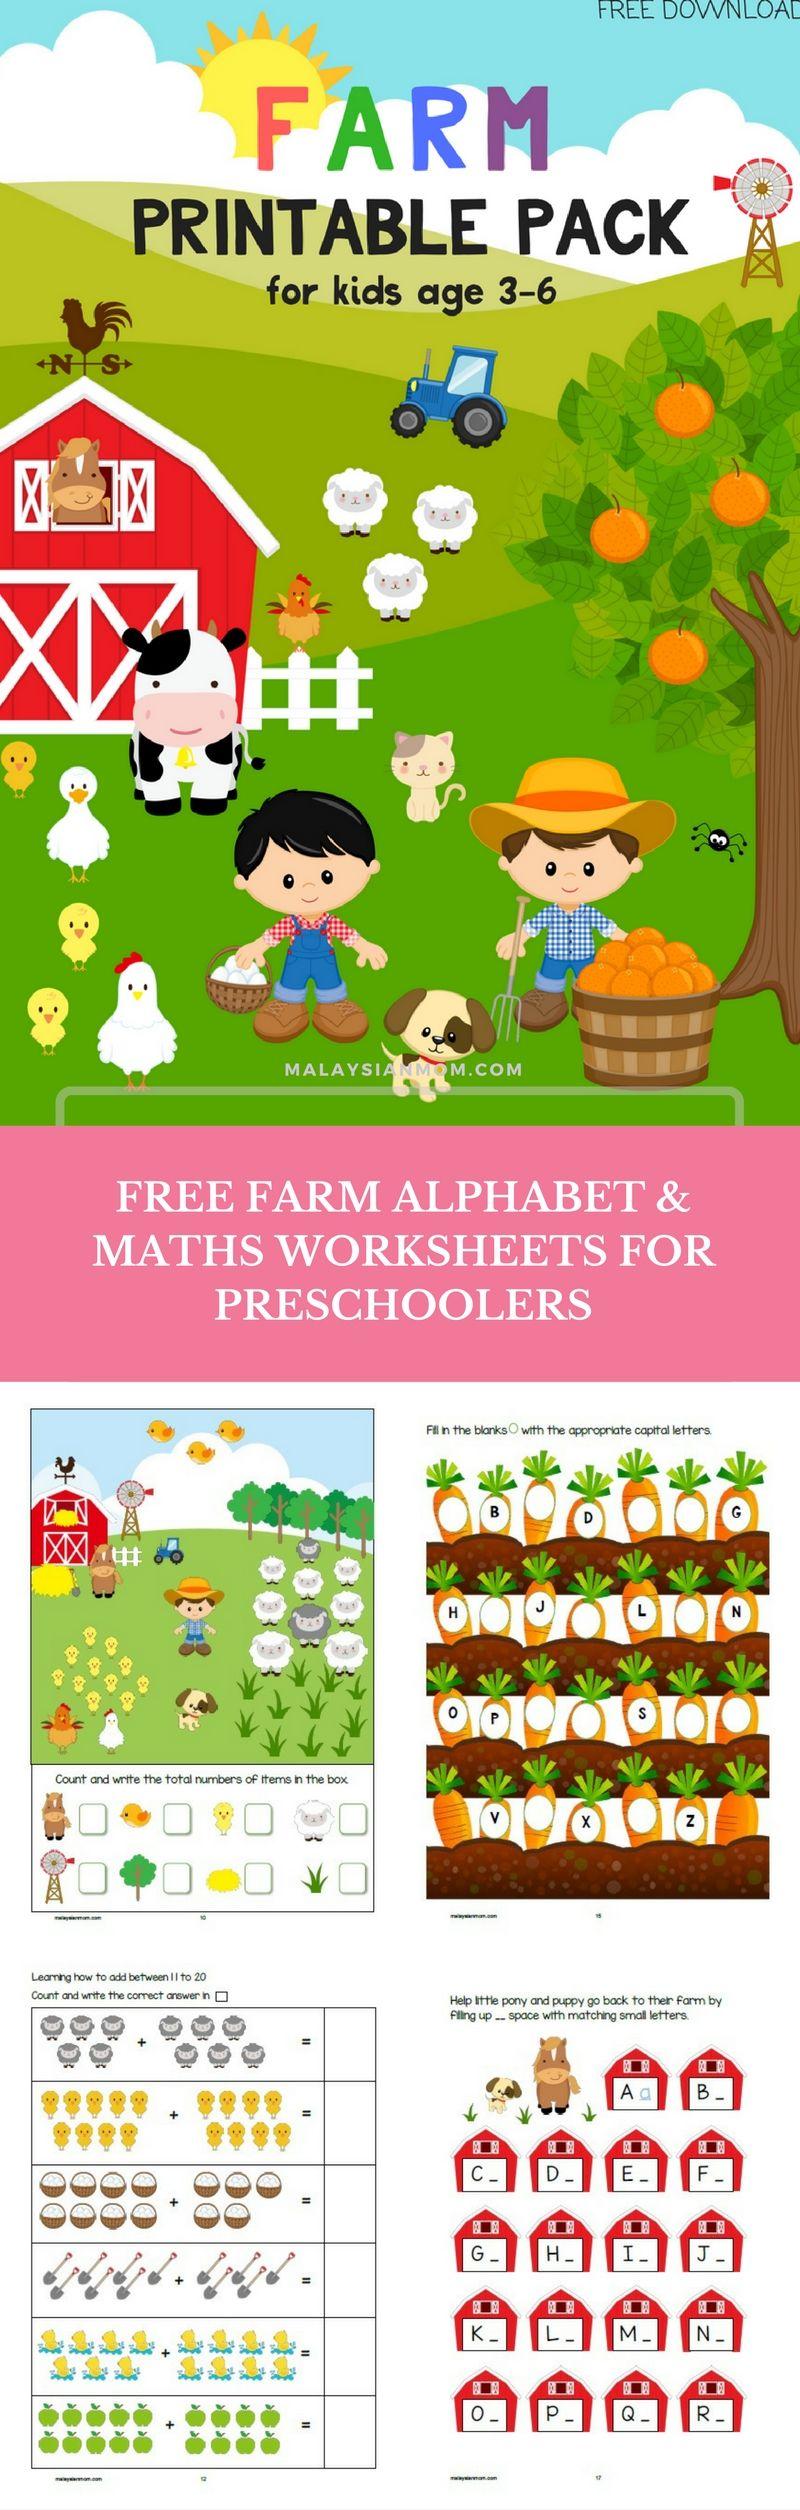 FARM PRINTABLE PACK | Literacy worksheets, Preschool themes and Free ...